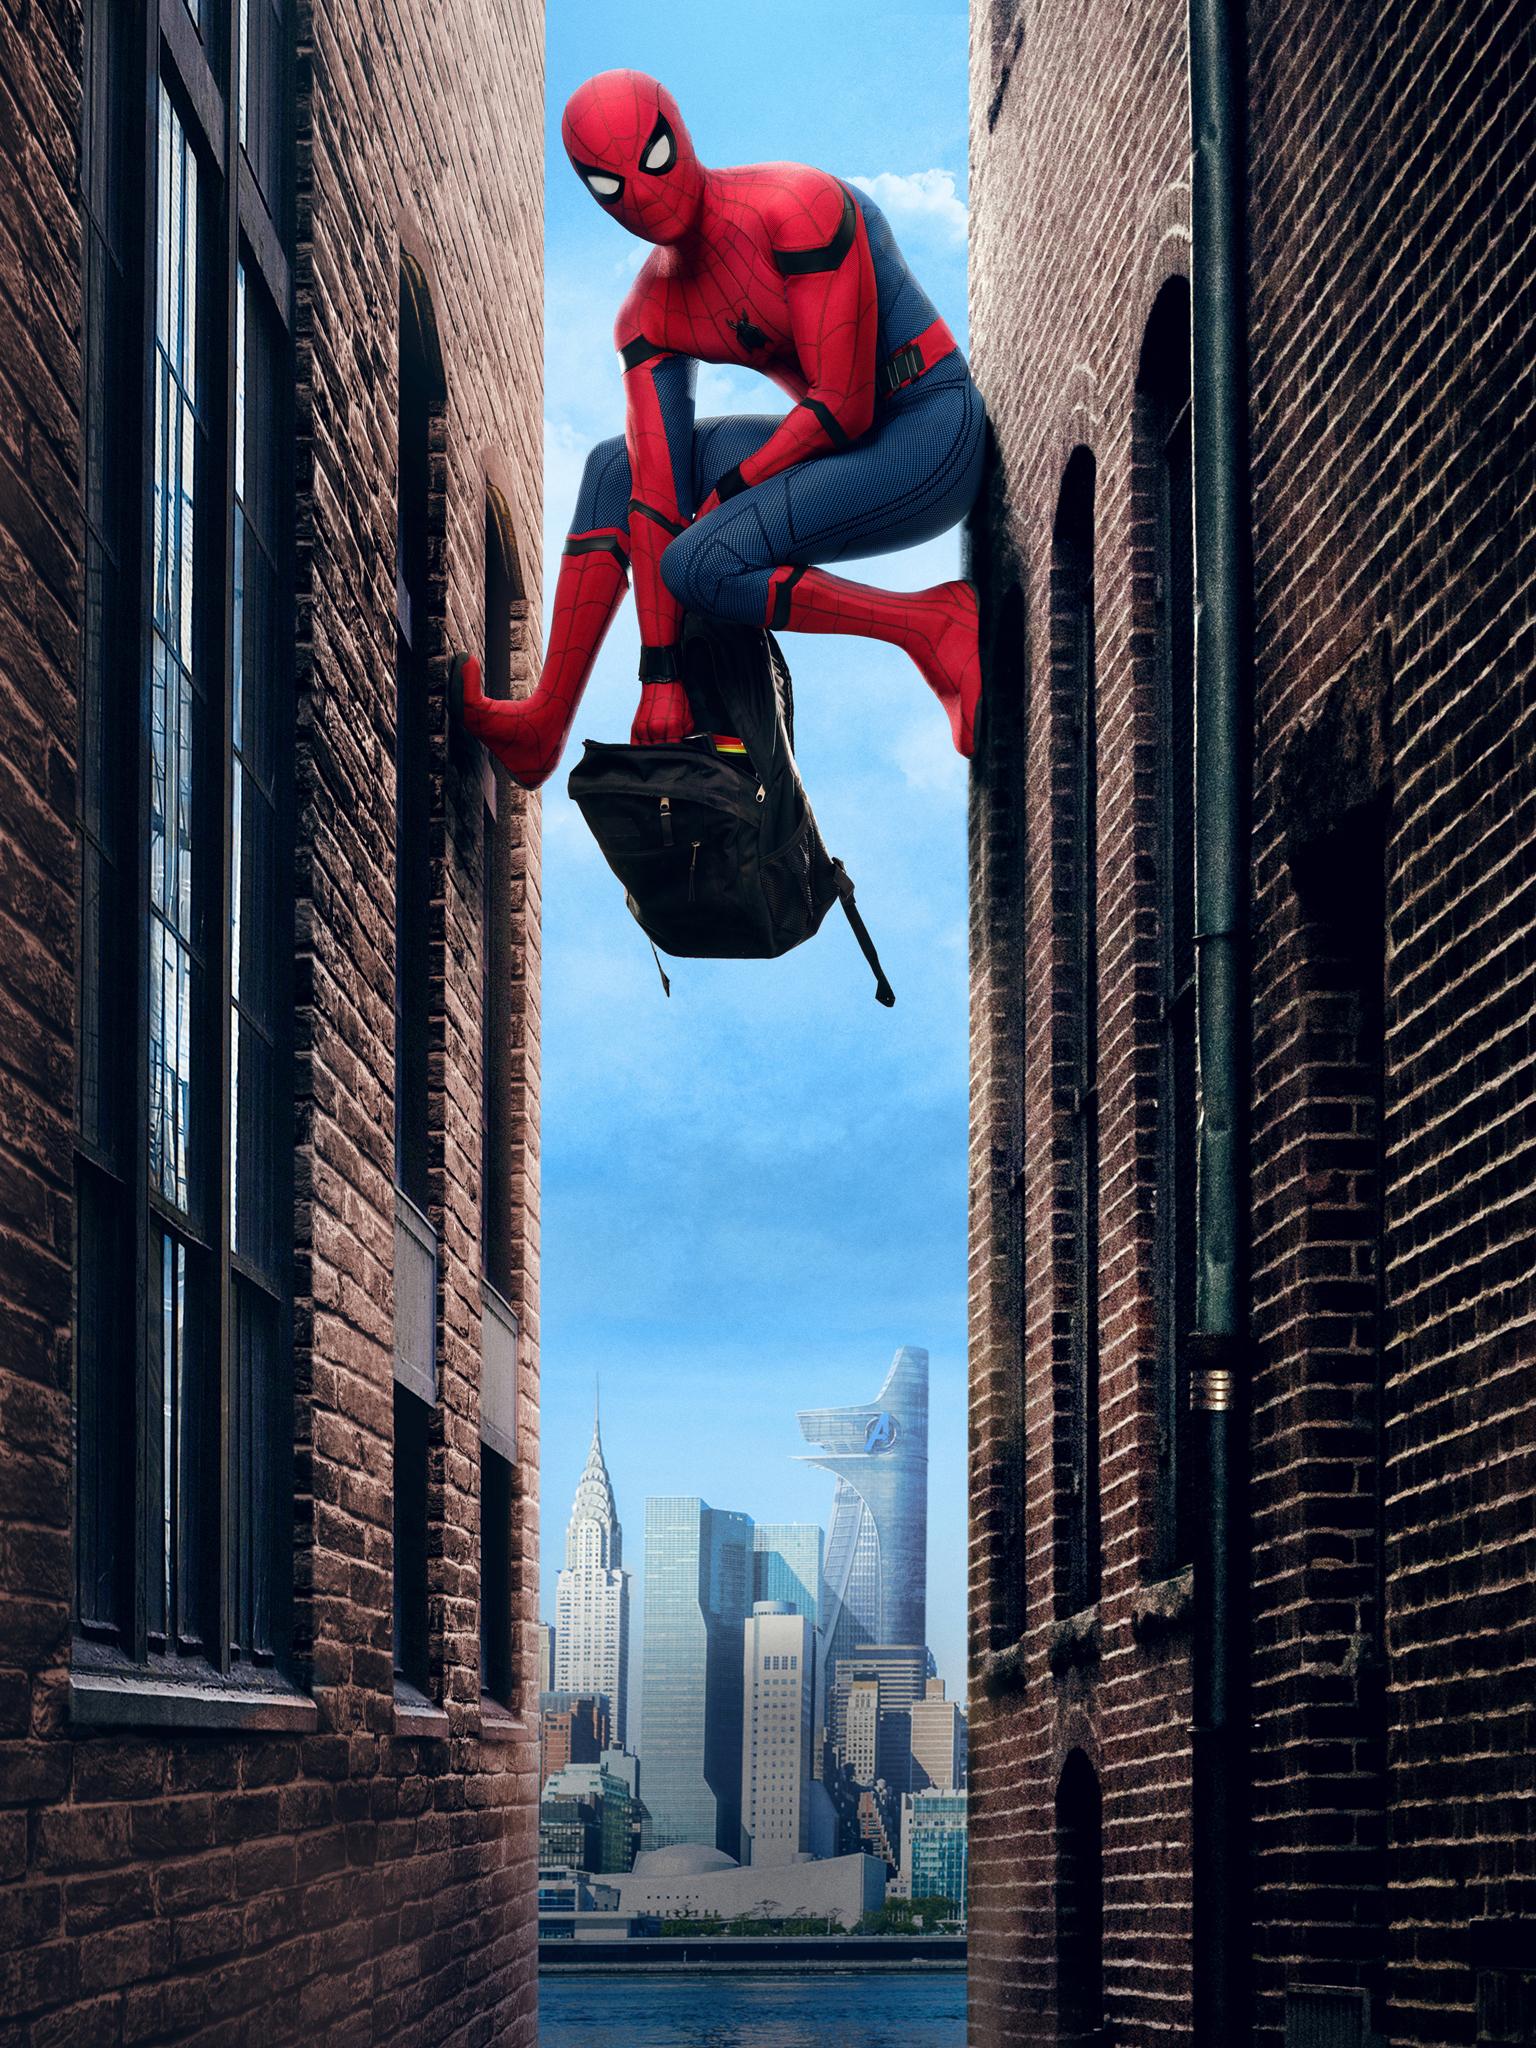 Wallpaper Spider Man Homecoming Movie Peter Parker